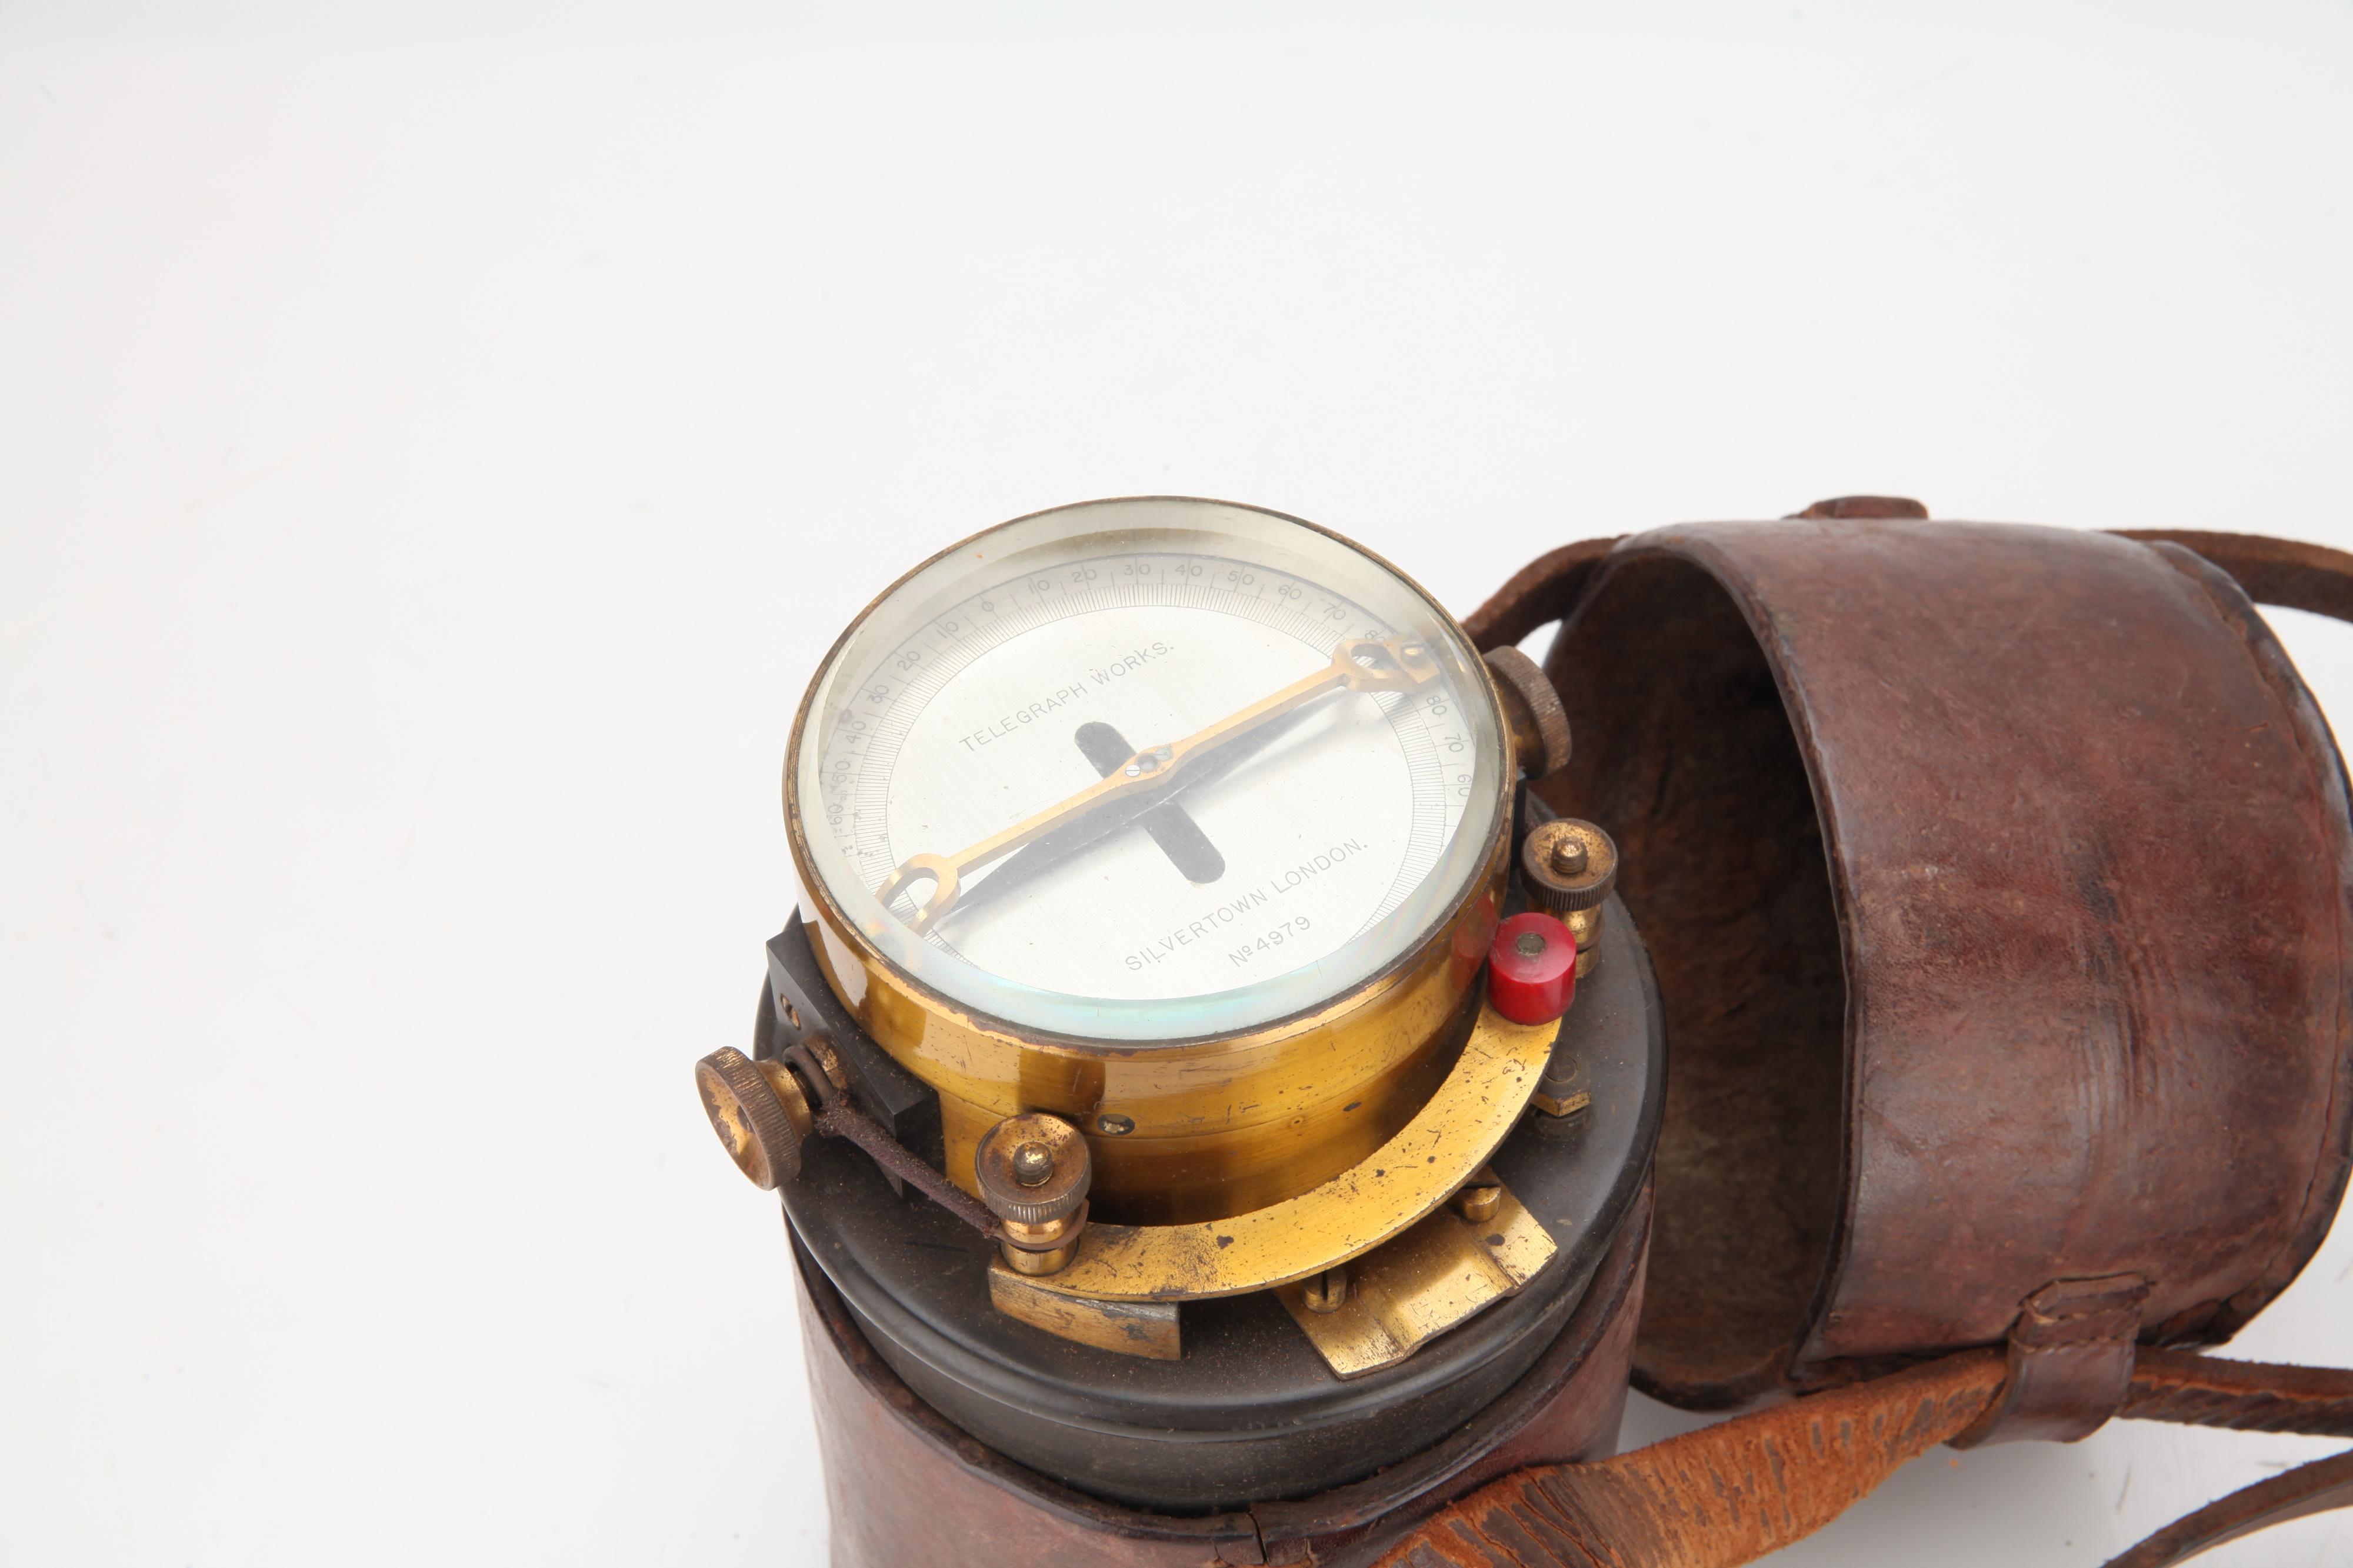 A Telegraph Line Test Galvanometer, - Image 2 of 3